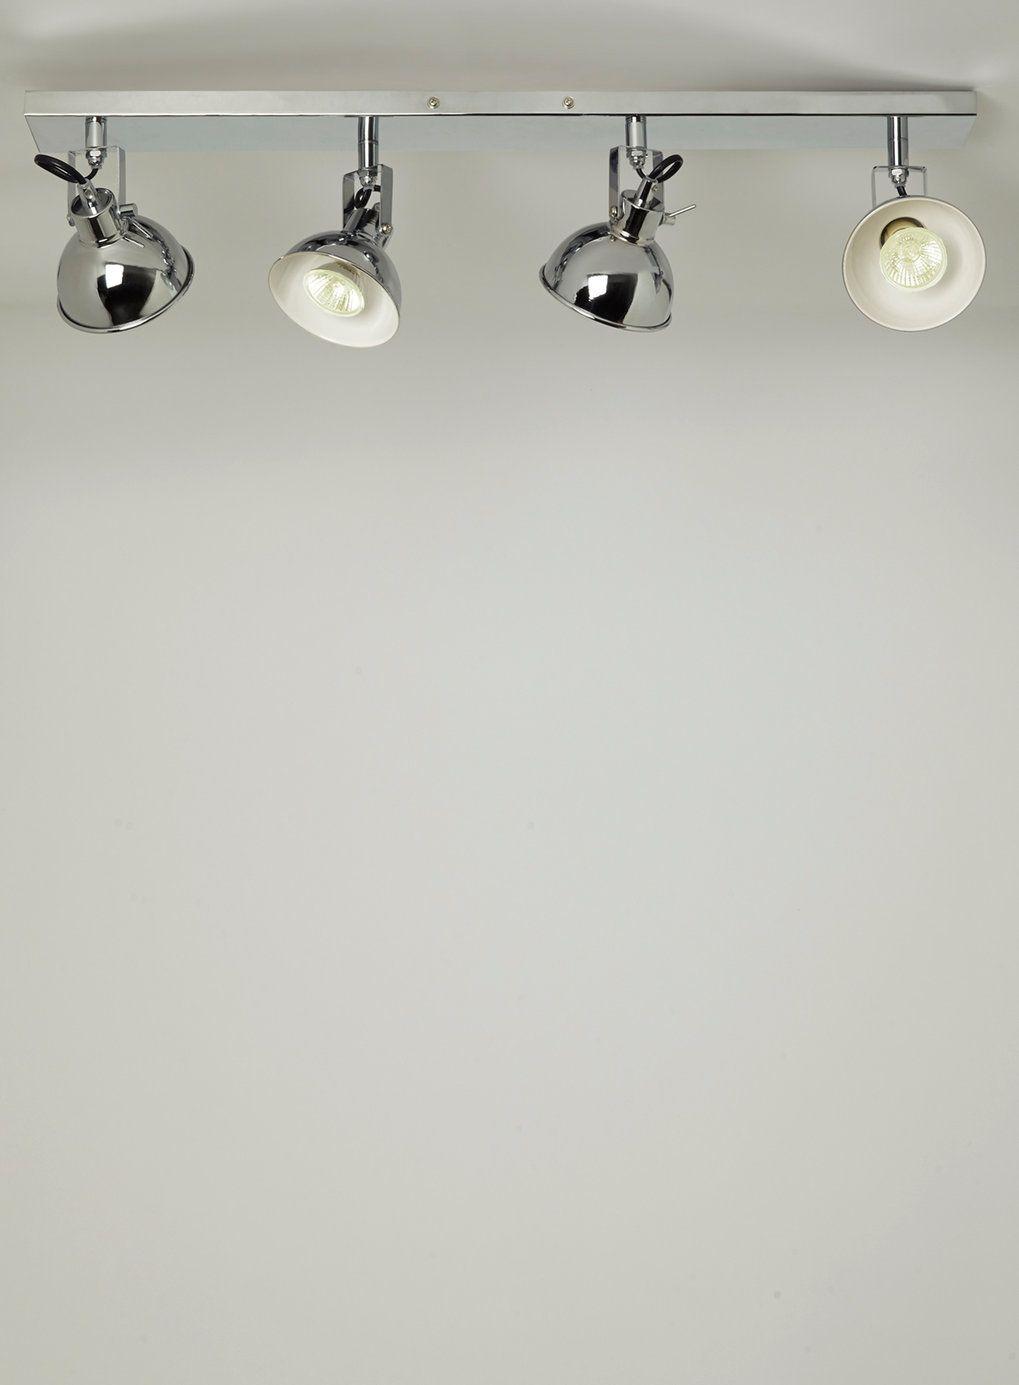 bhs light for kitchen - Spotlight Kitchen Lights